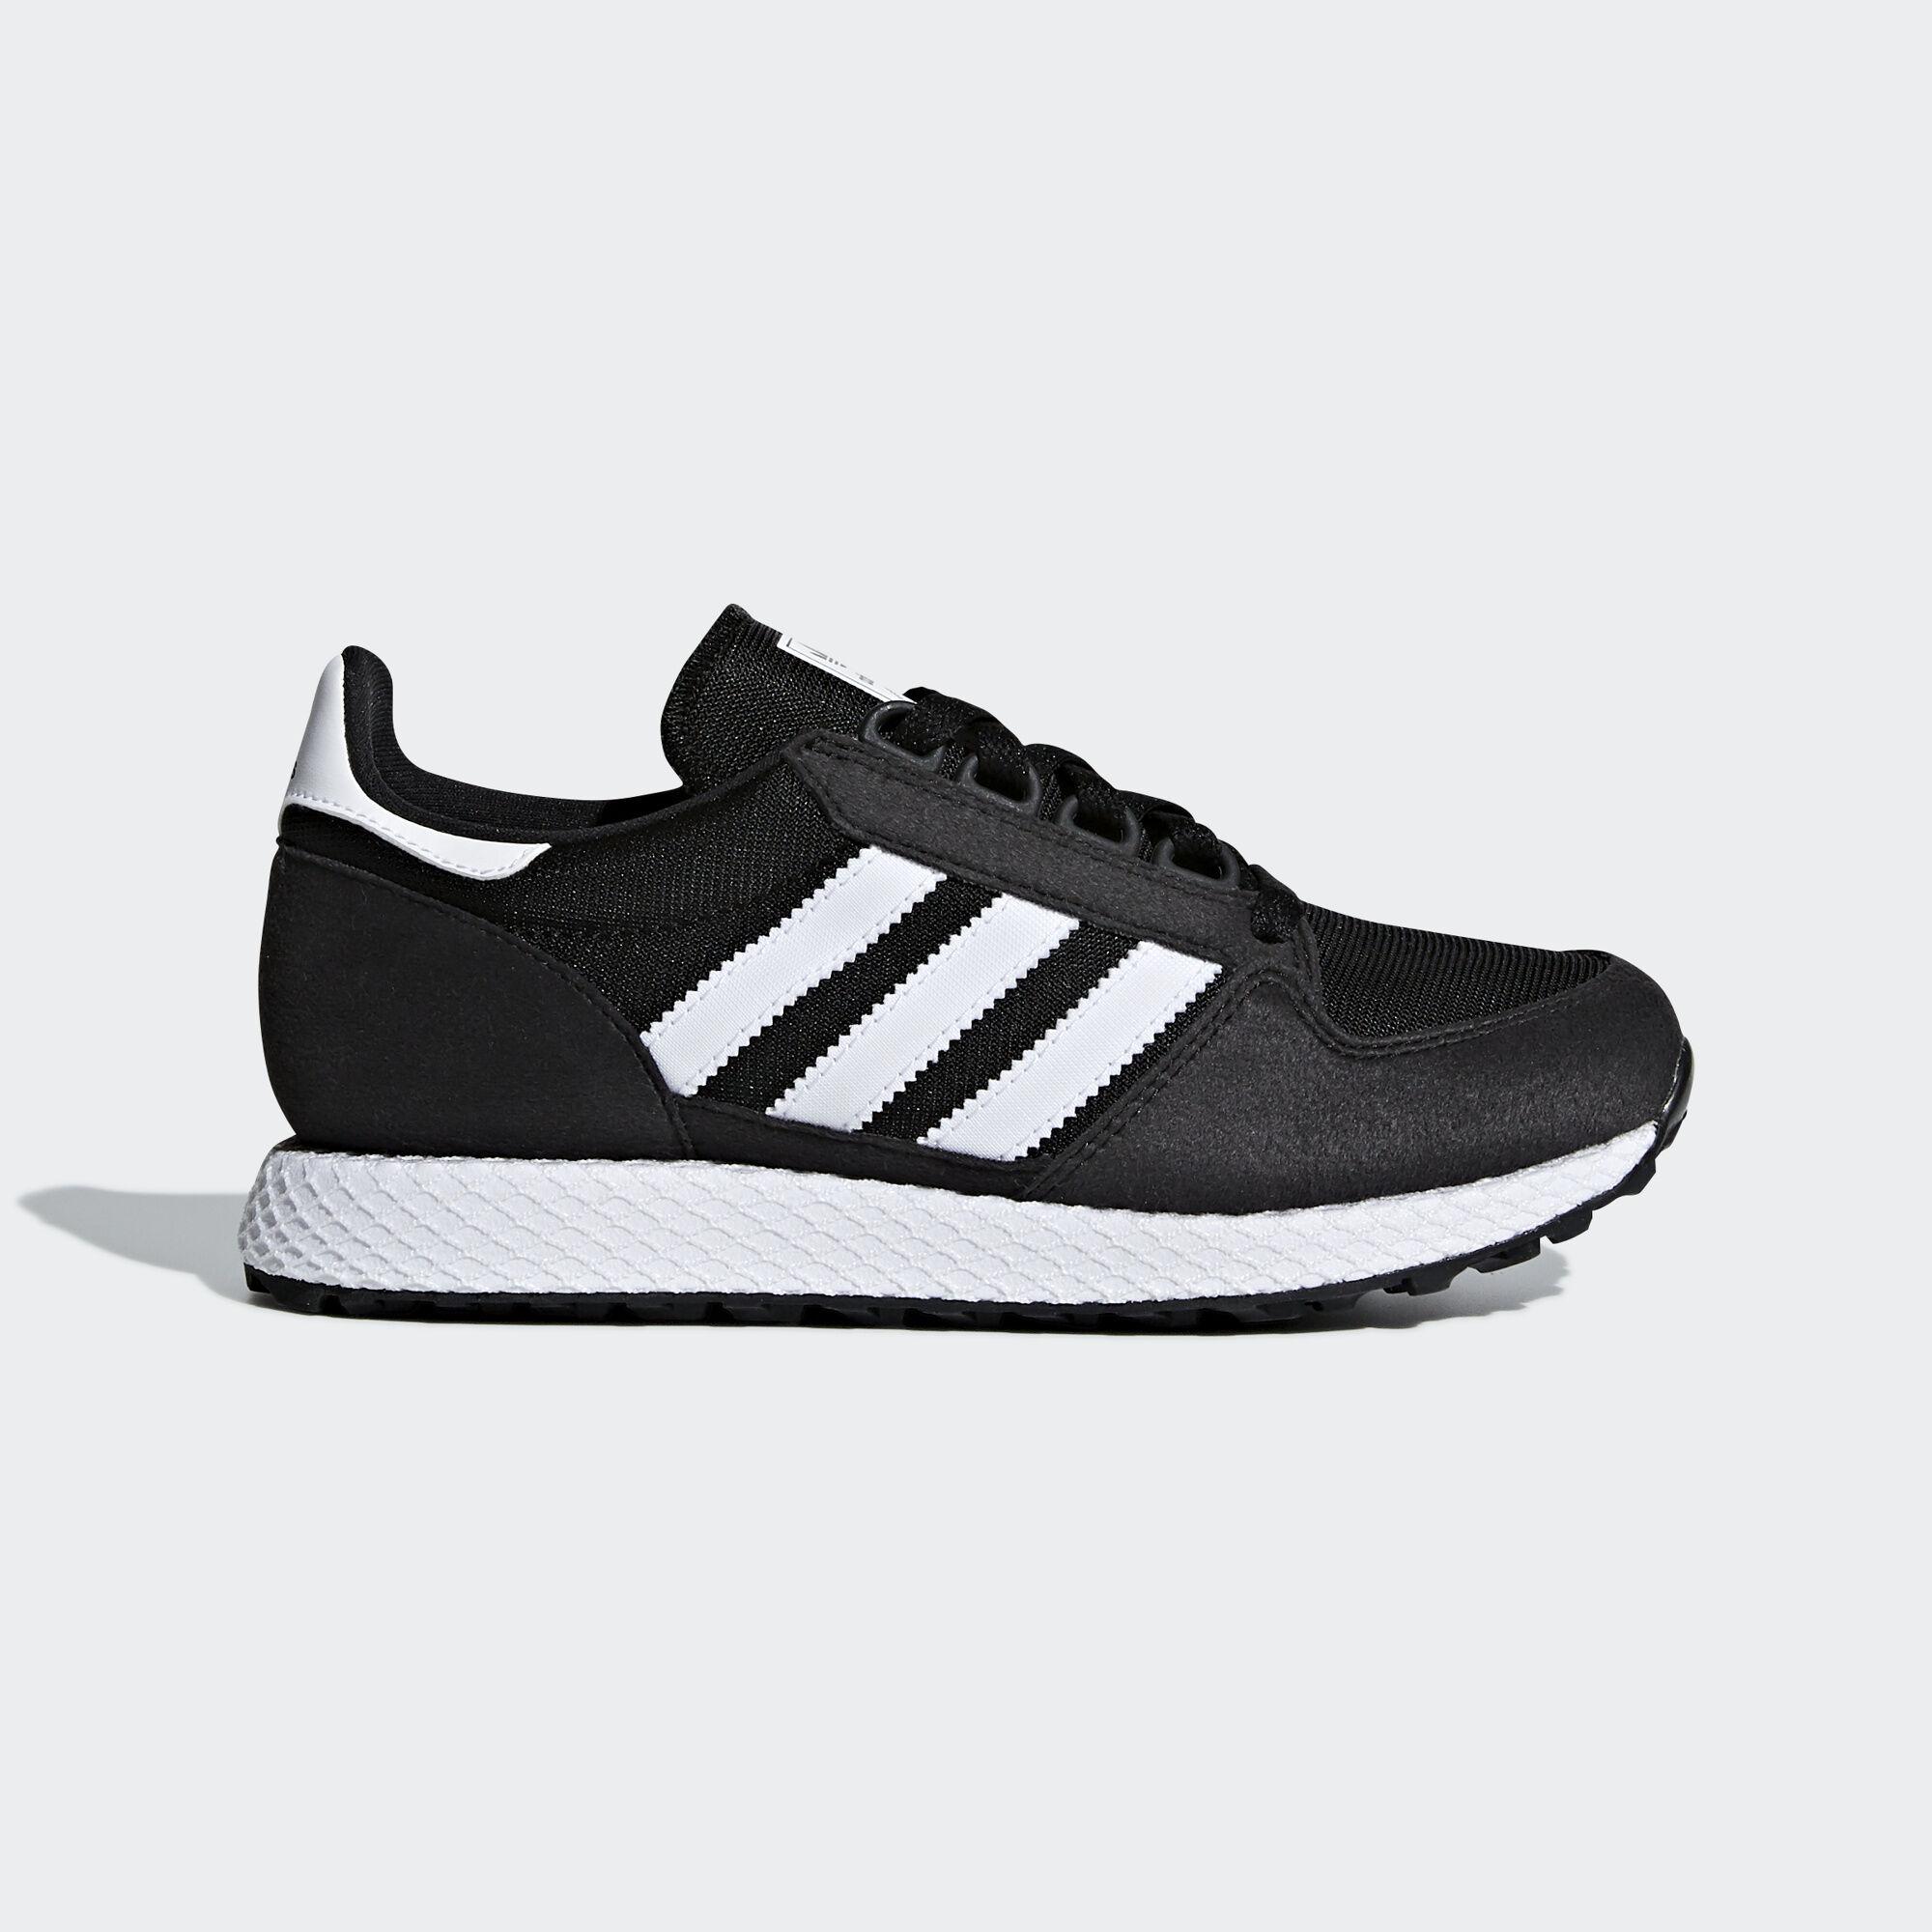 adidas - Forest Grove Shoes Core Black   Ftwr White   Core Black B37743.  Kids Originals 6dad2f2467